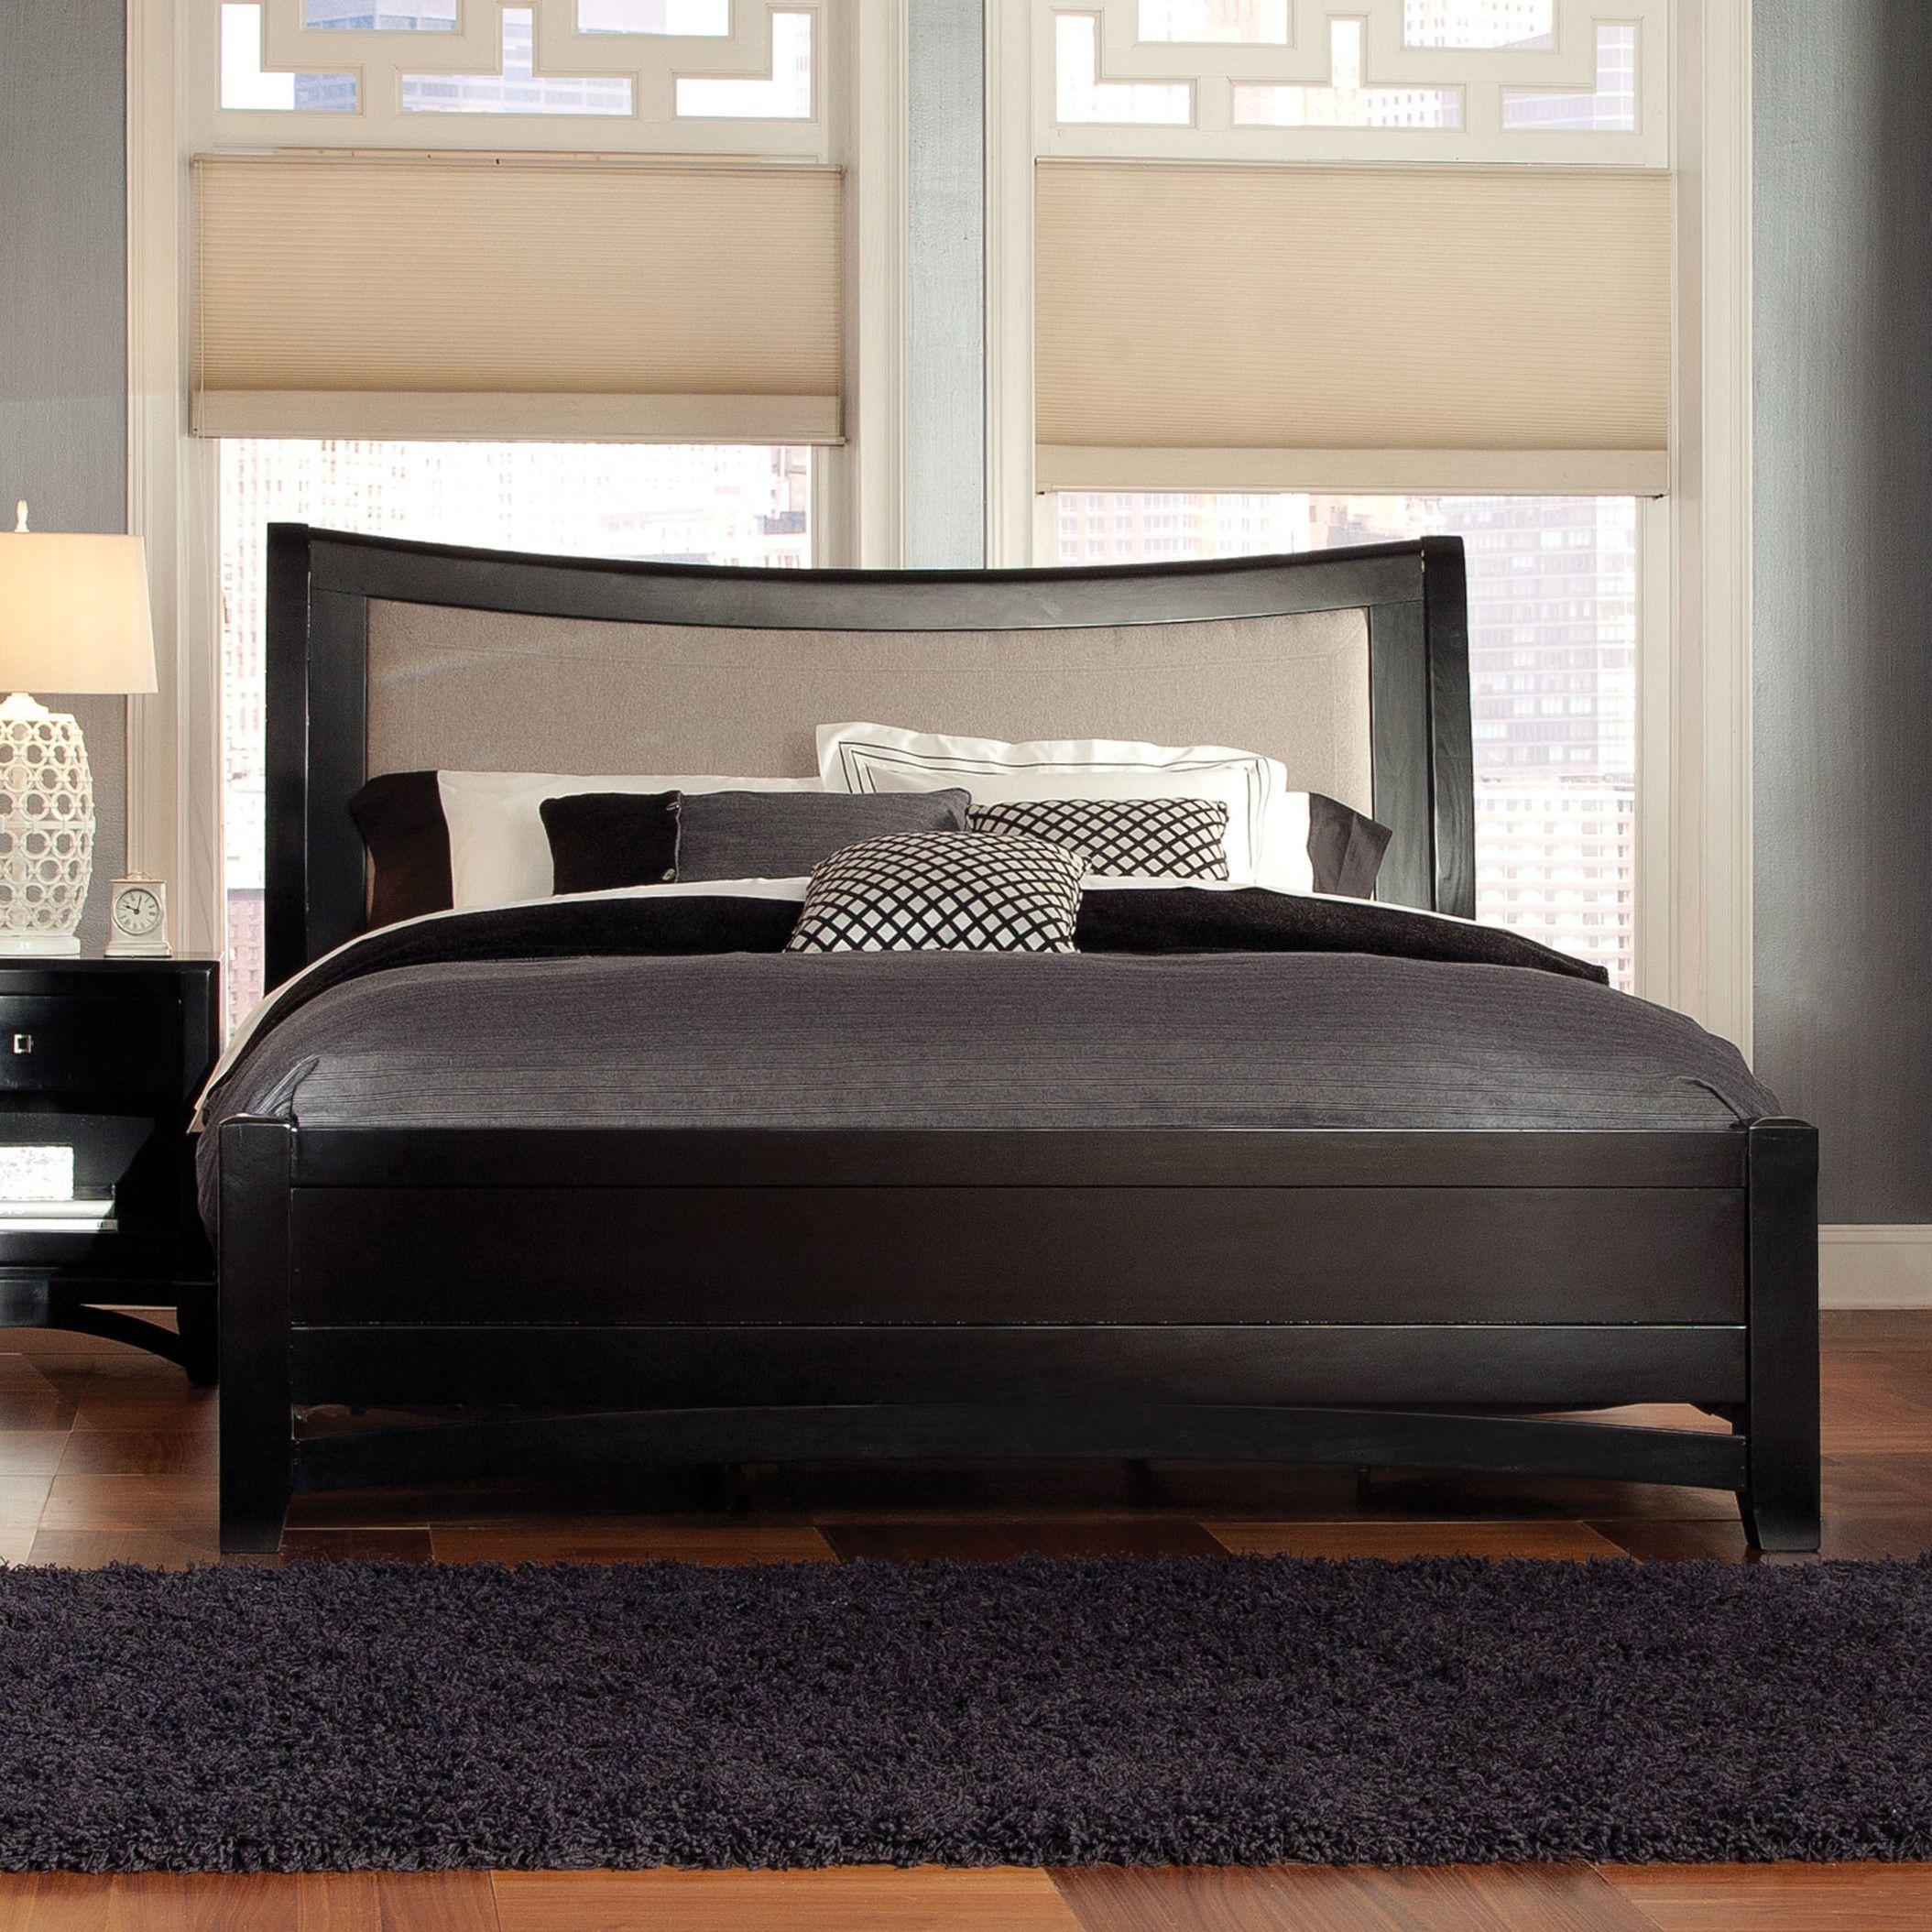 Standard Furniture Grand Designs Http Ceplukan Xyz 060347